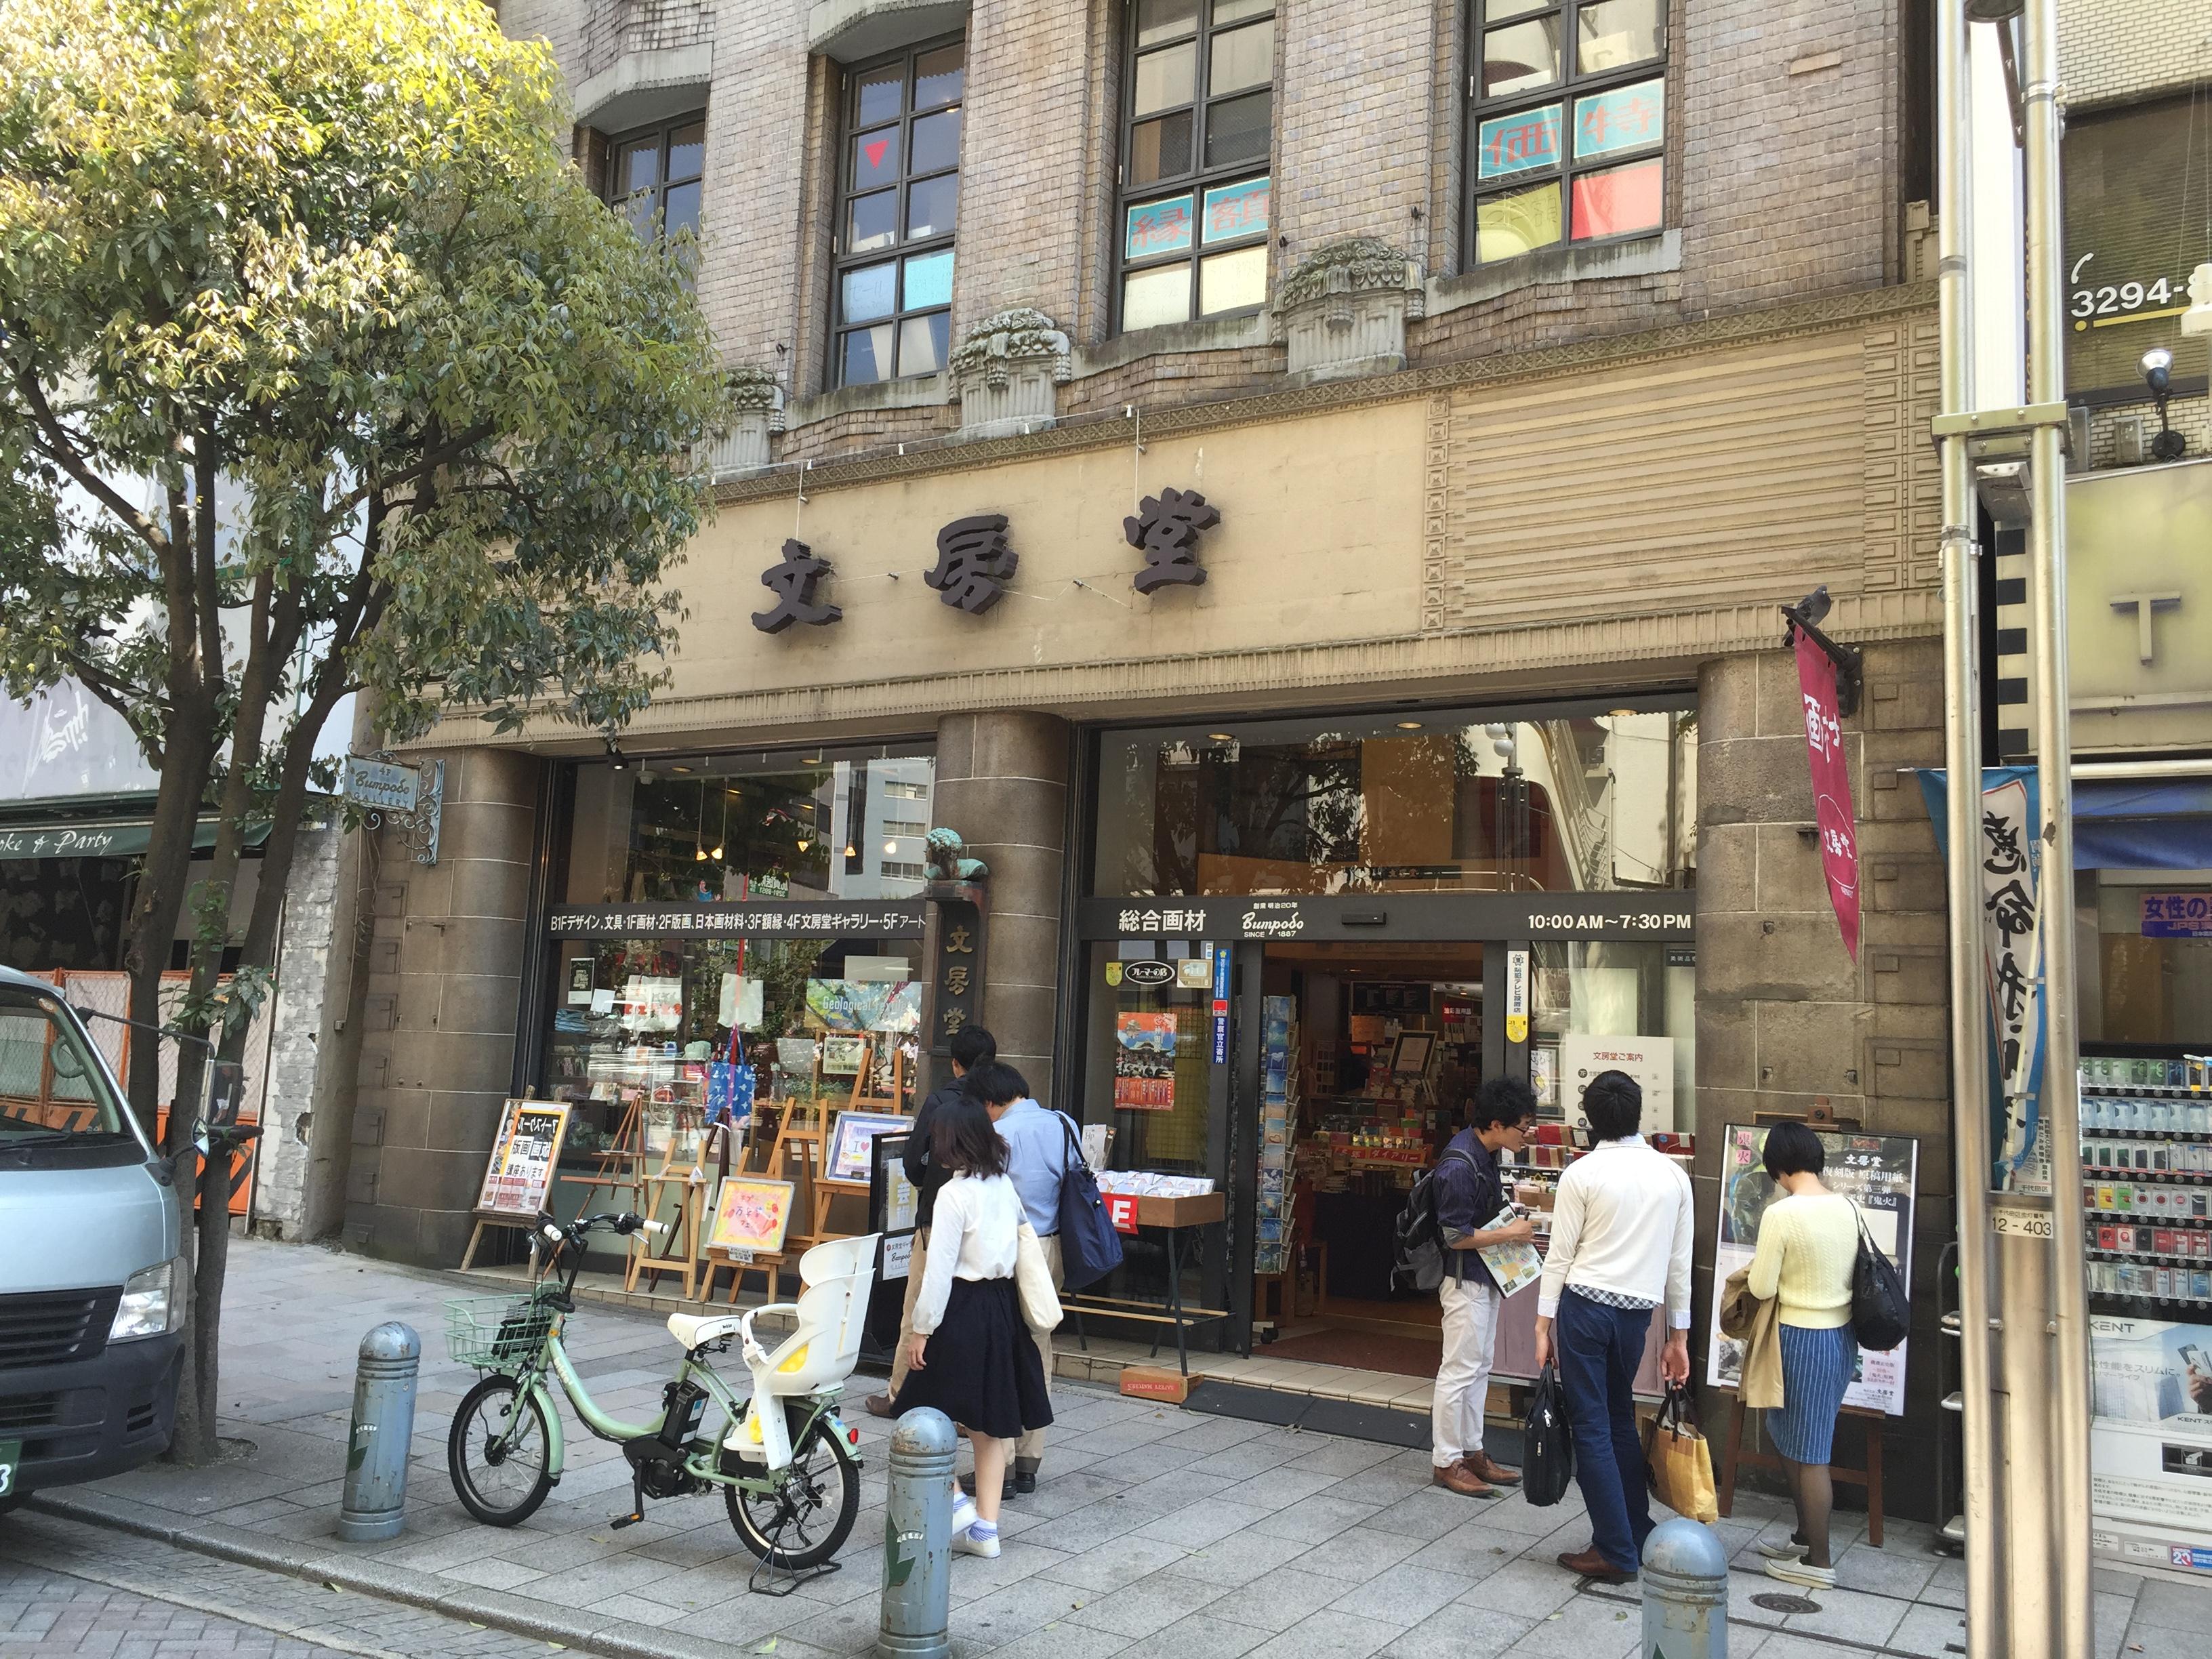 http://ud.t.u-tokyo.ac.jp/news/_images/IMG_4736.JPG